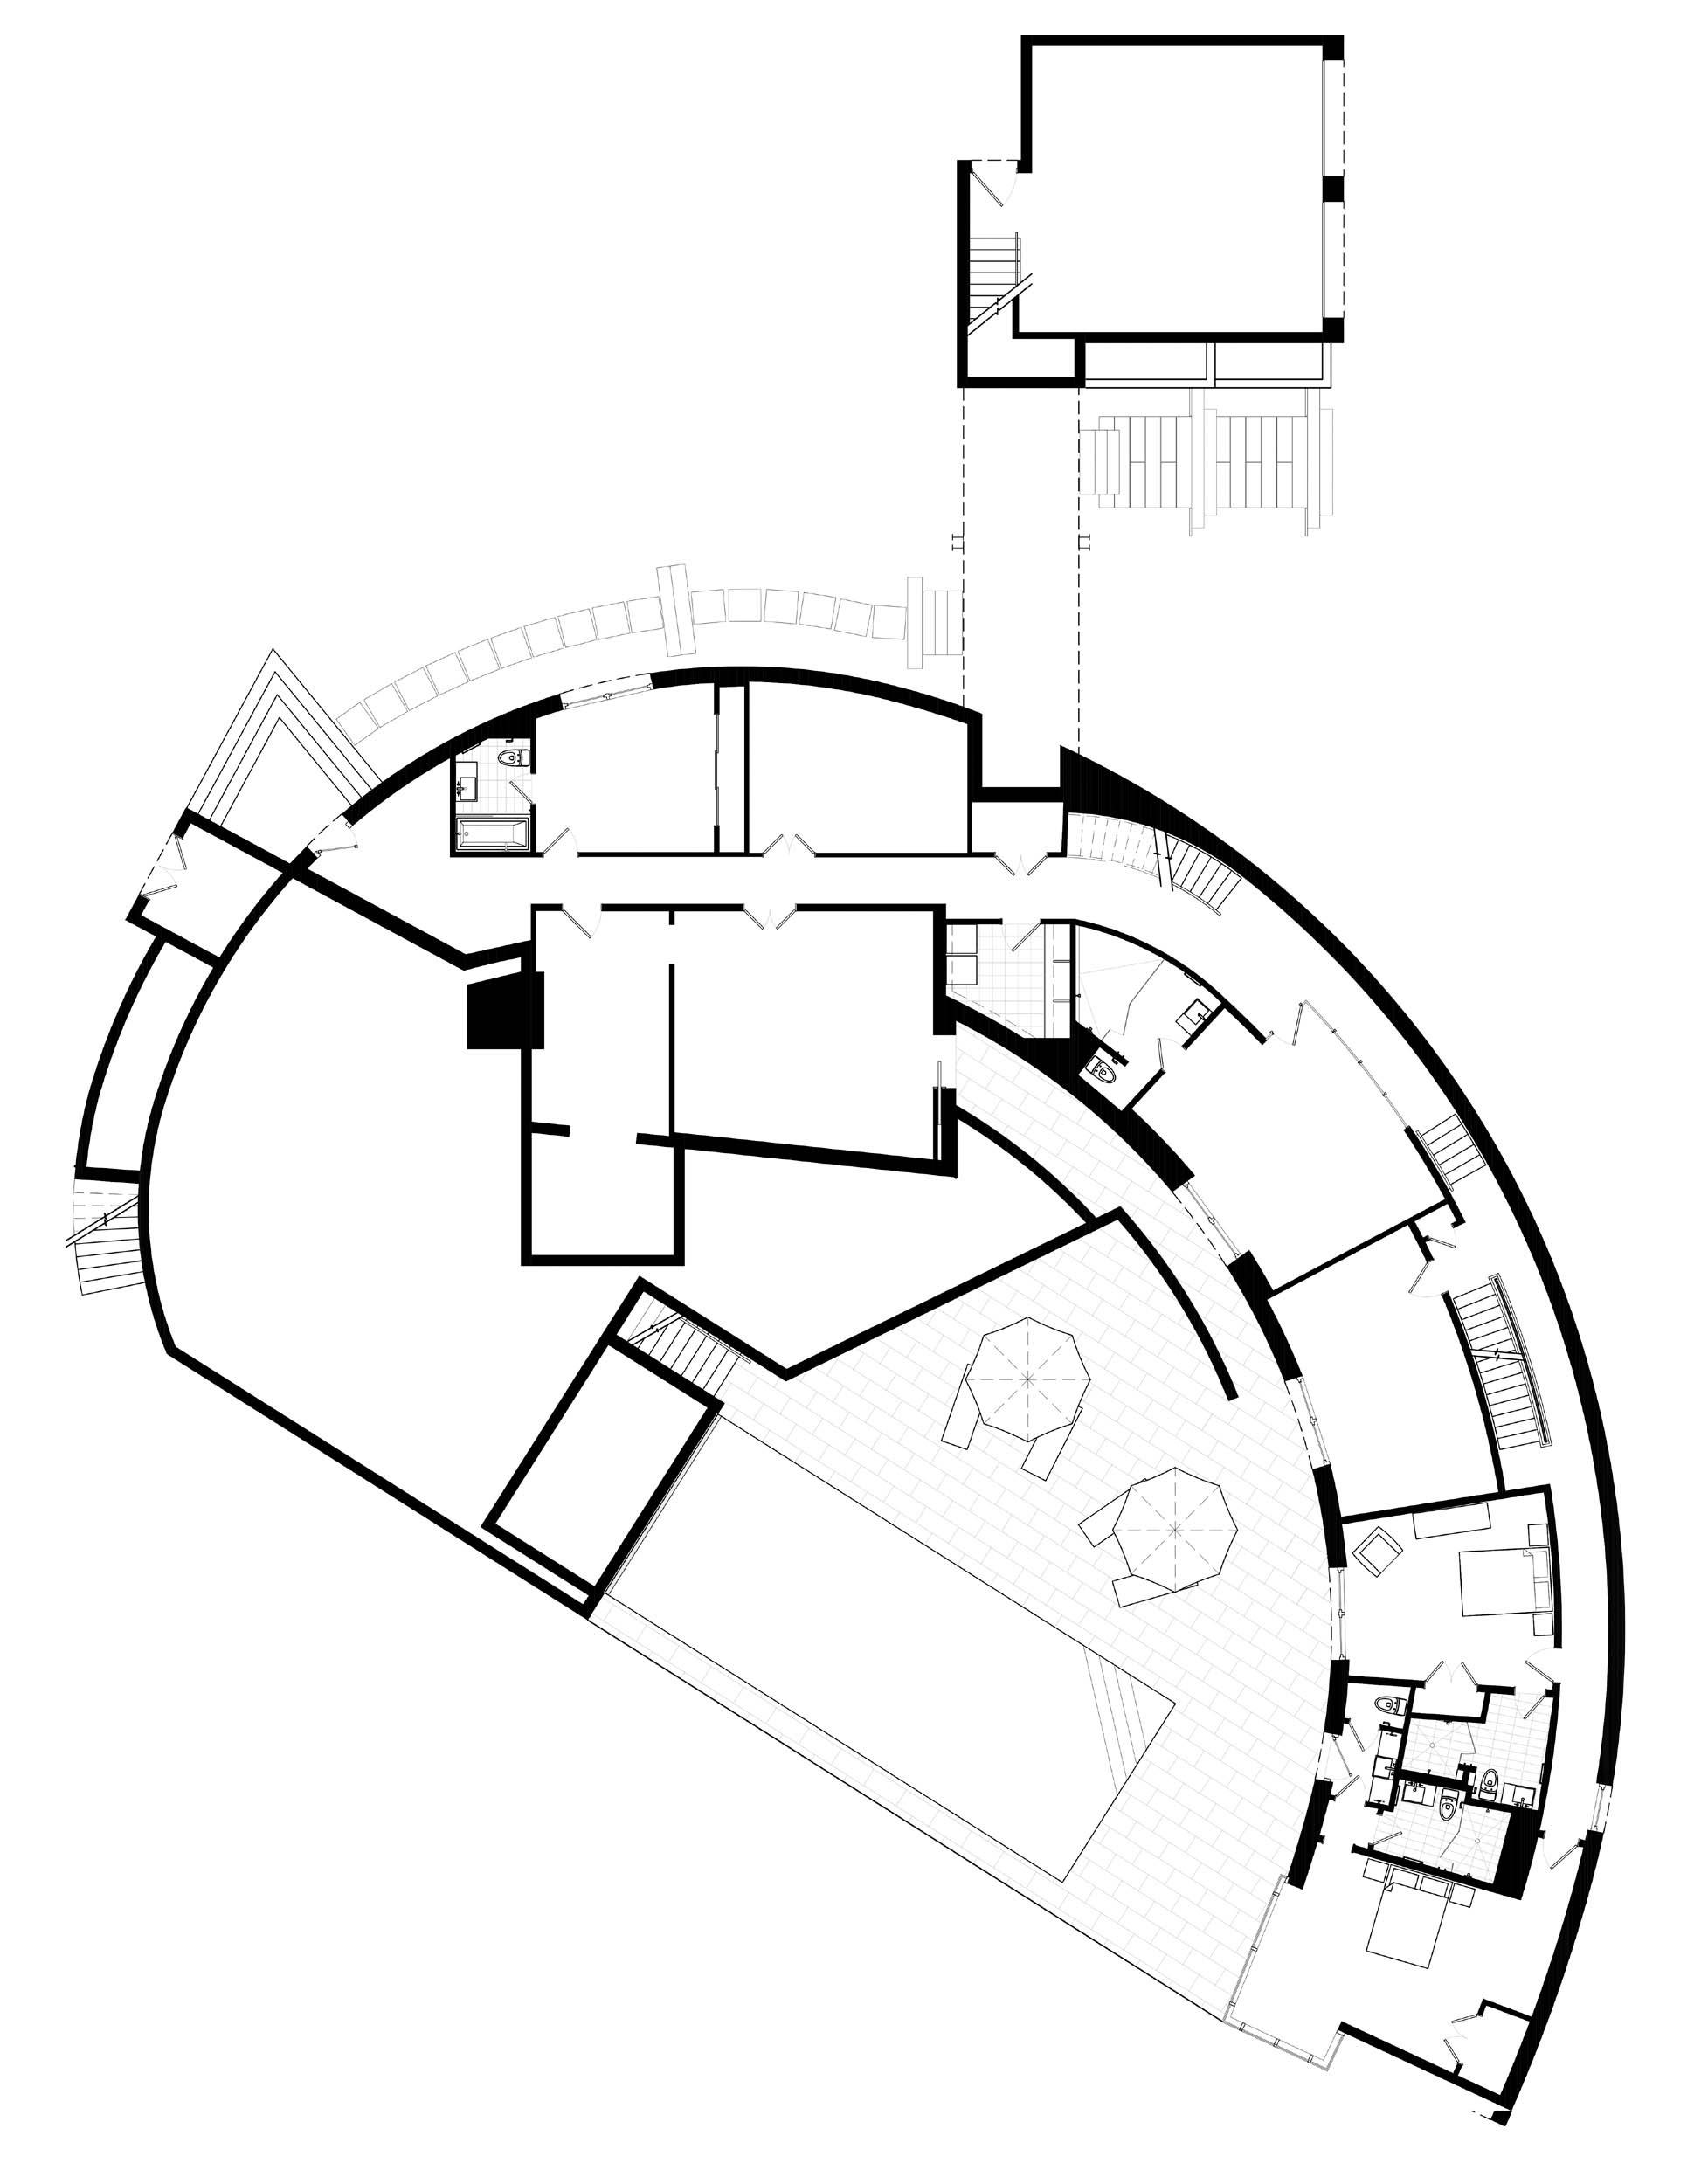 Ellipse - Barnes Coy Architects - Hamptons Architetcs